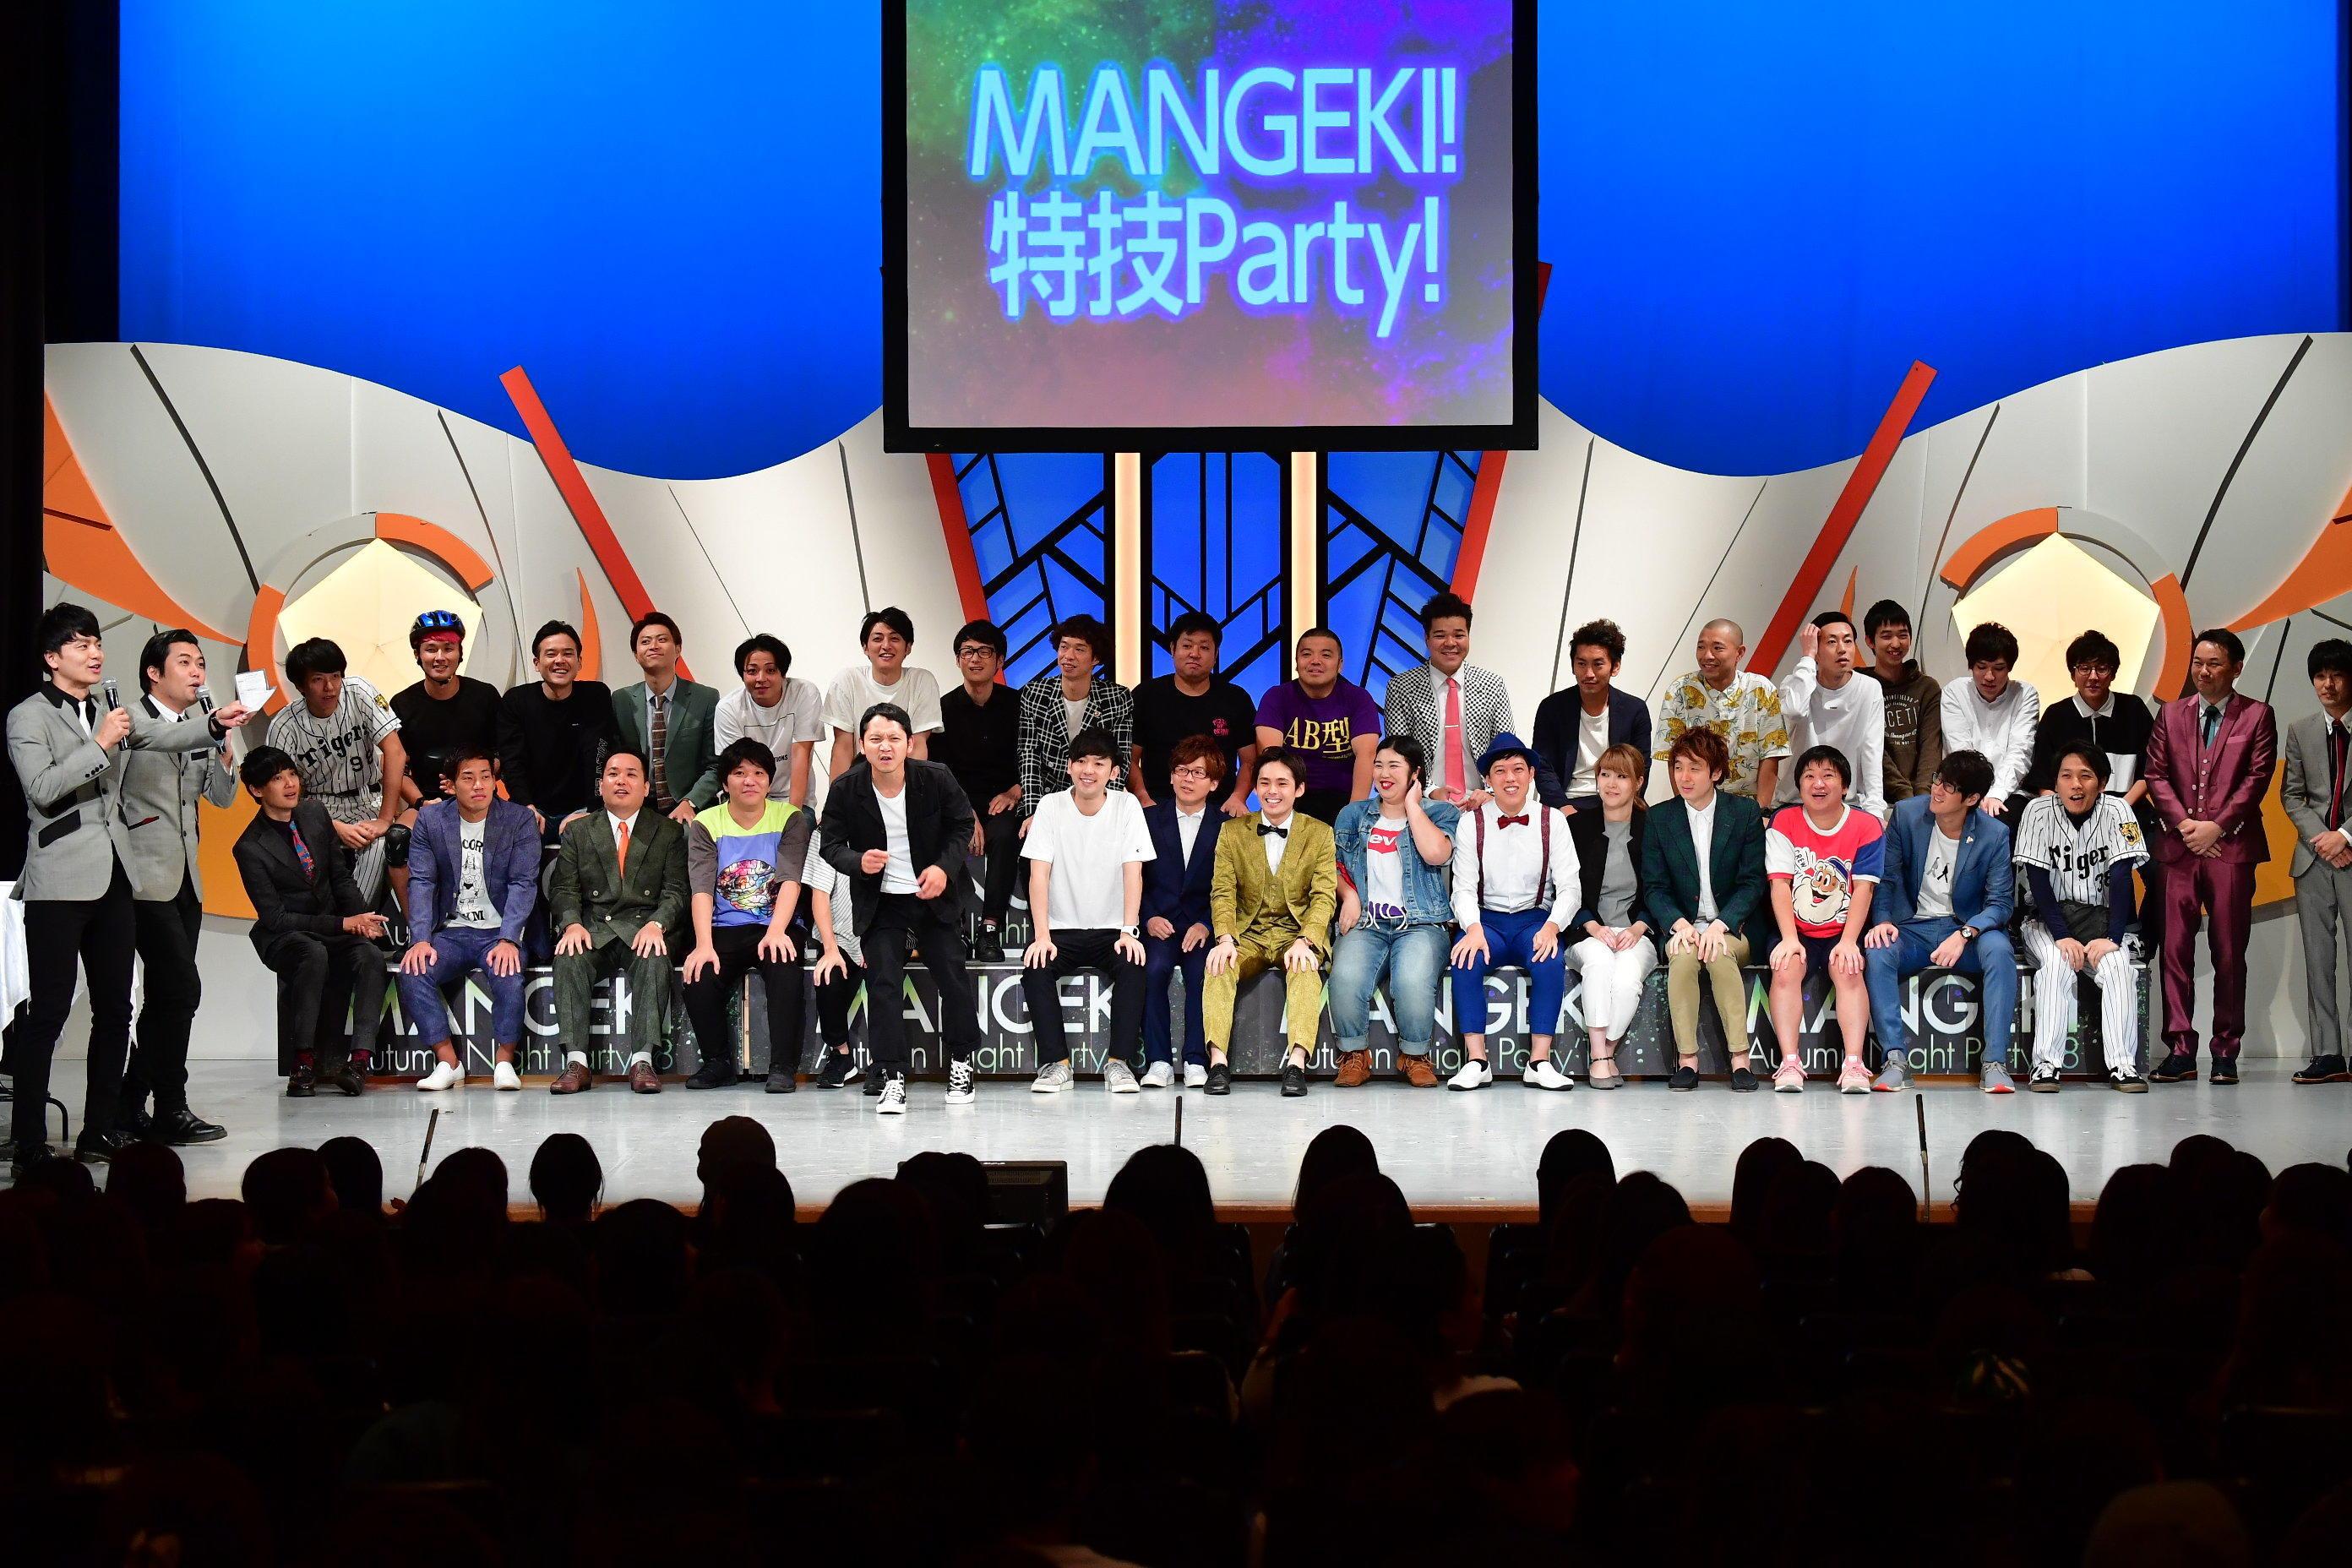 http://news.yoshimoto.co.jp/20180925140911-07f6ccc6659c07fbf4a8da1e9a34b585f0a2cf58.jpg